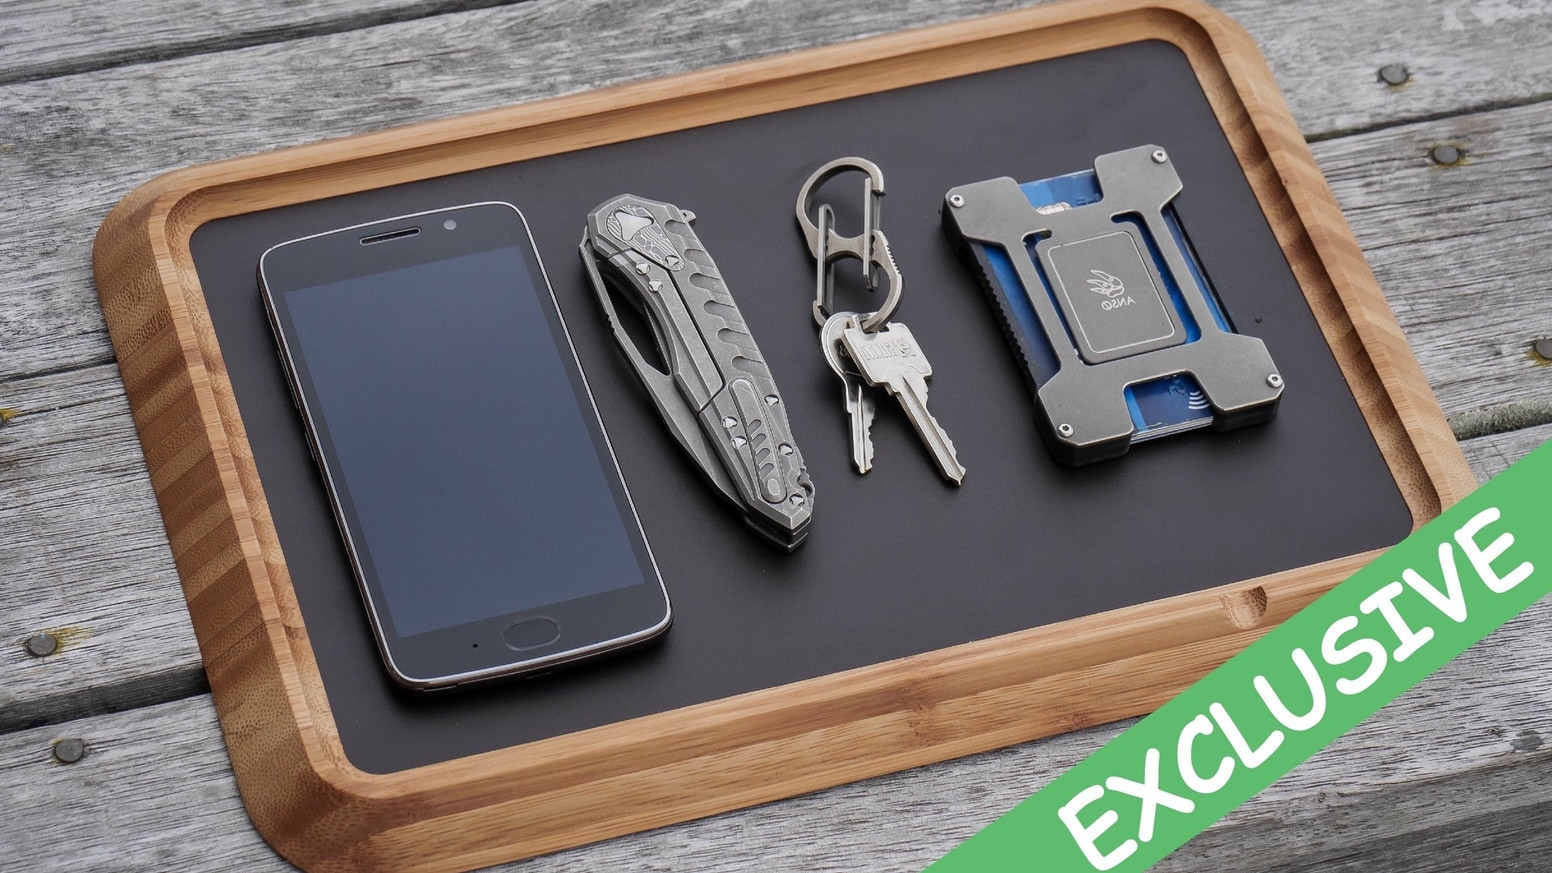 everyday carry tray the edc life tray by sonja ostermeier